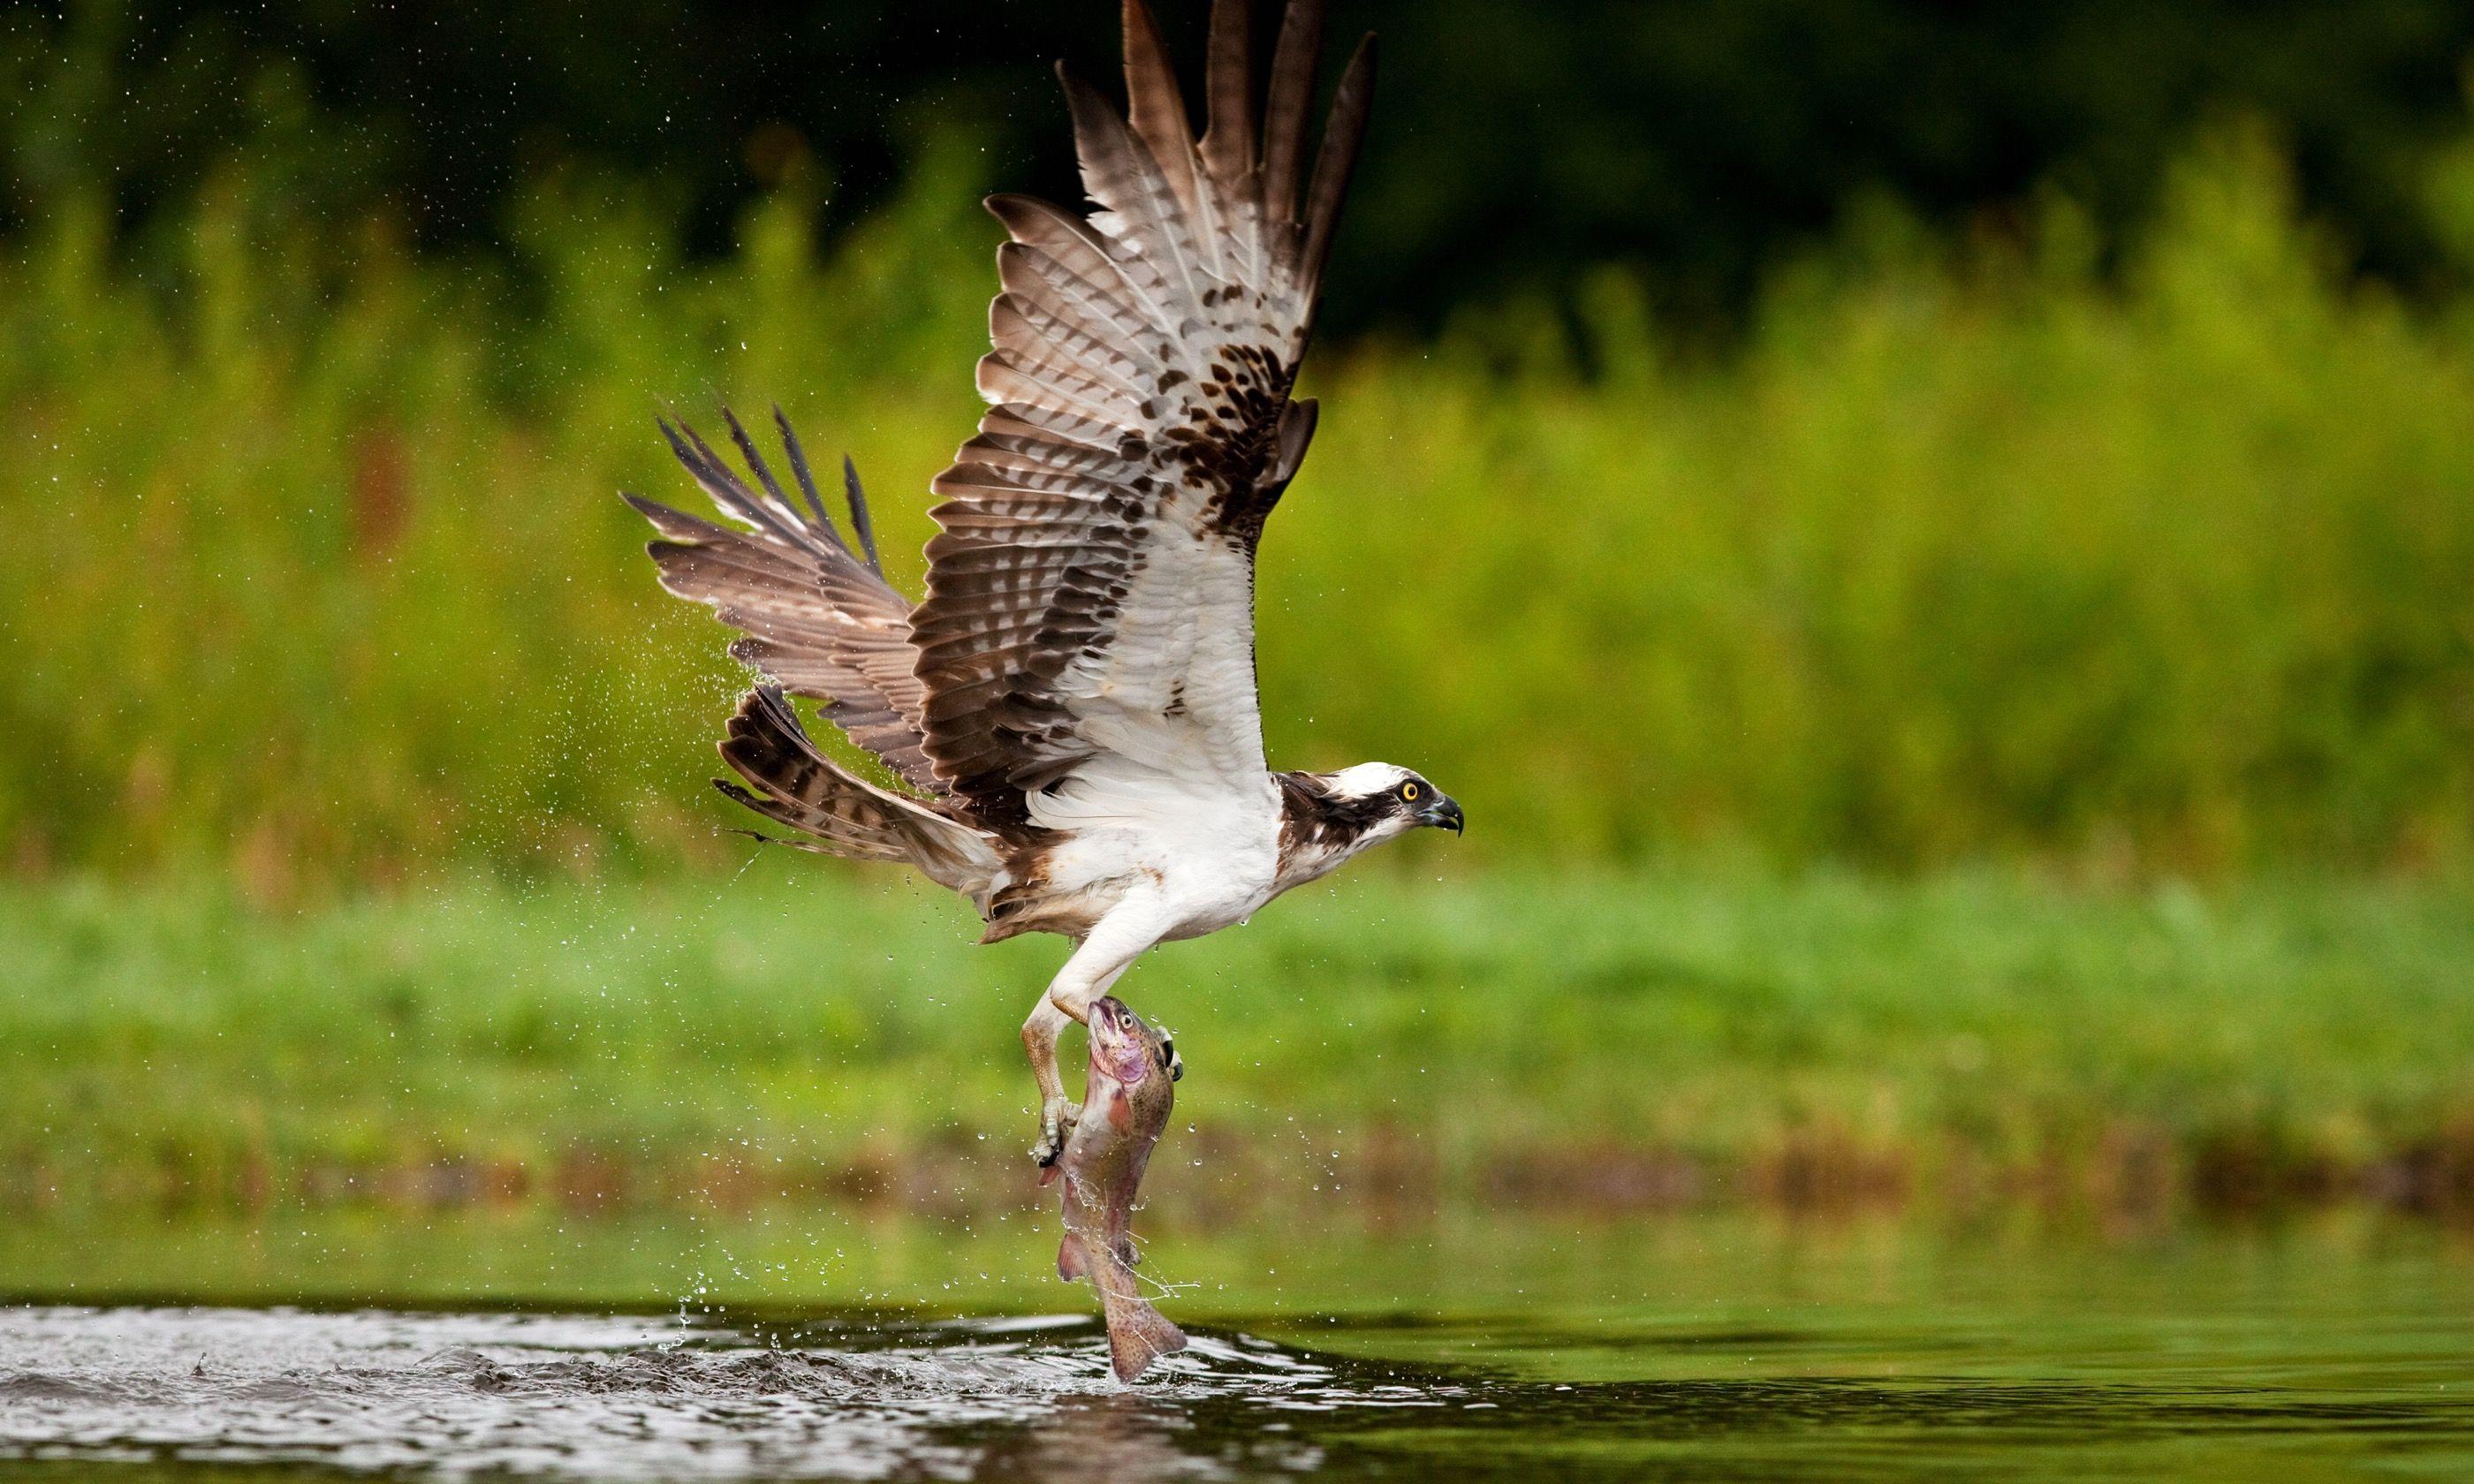 Osprey catching fish (Shutterstock.com)